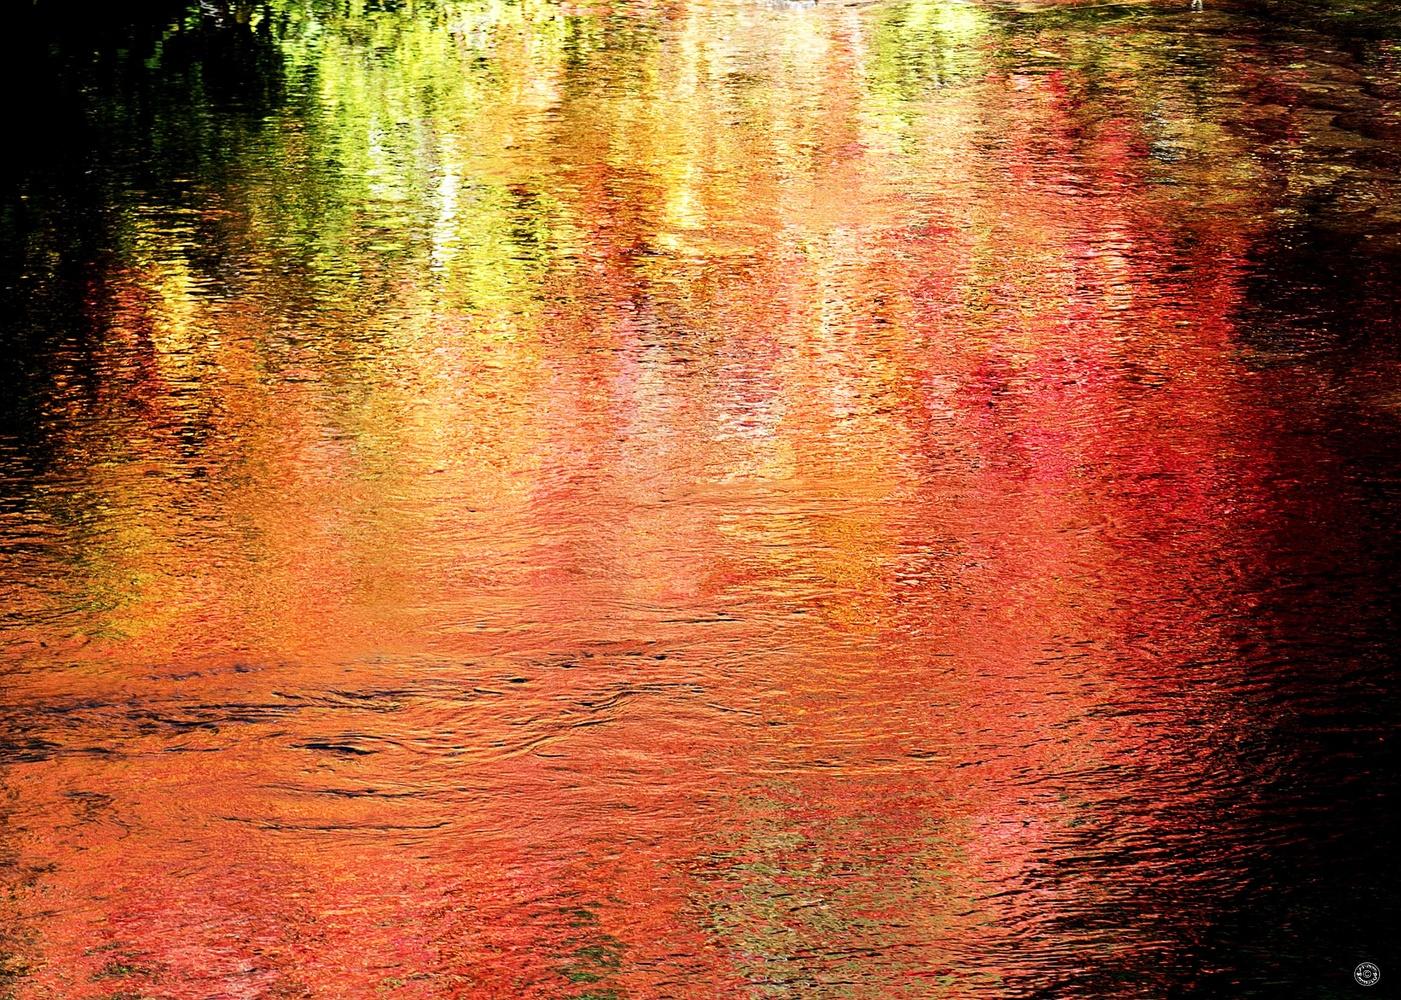 Reflection by Darrell Potts